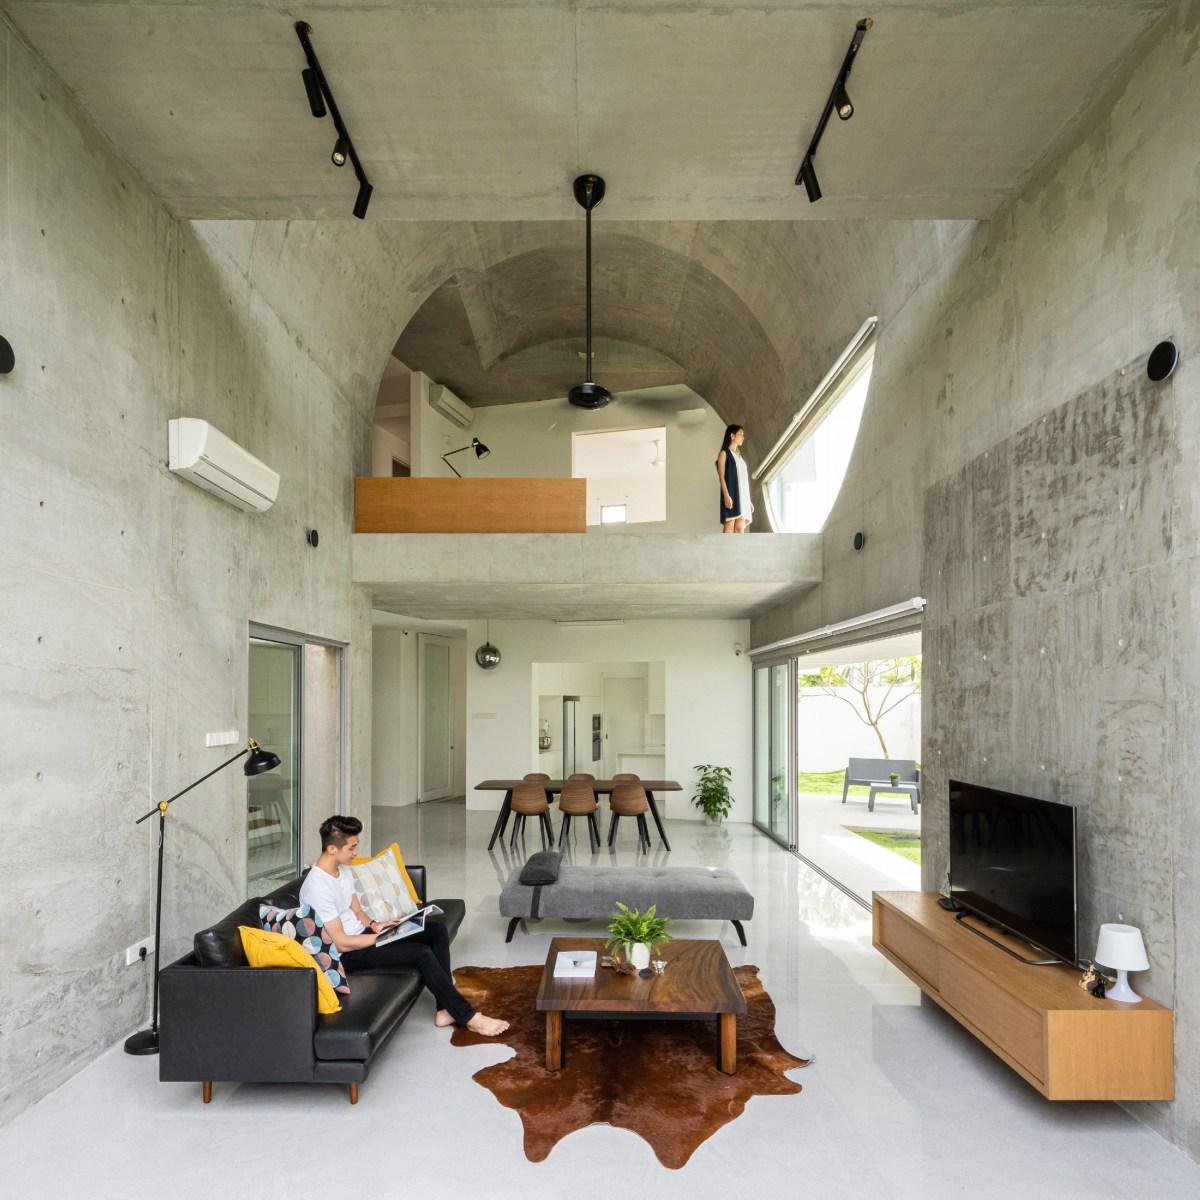 Bewboc House Fabian Tan Architect 04